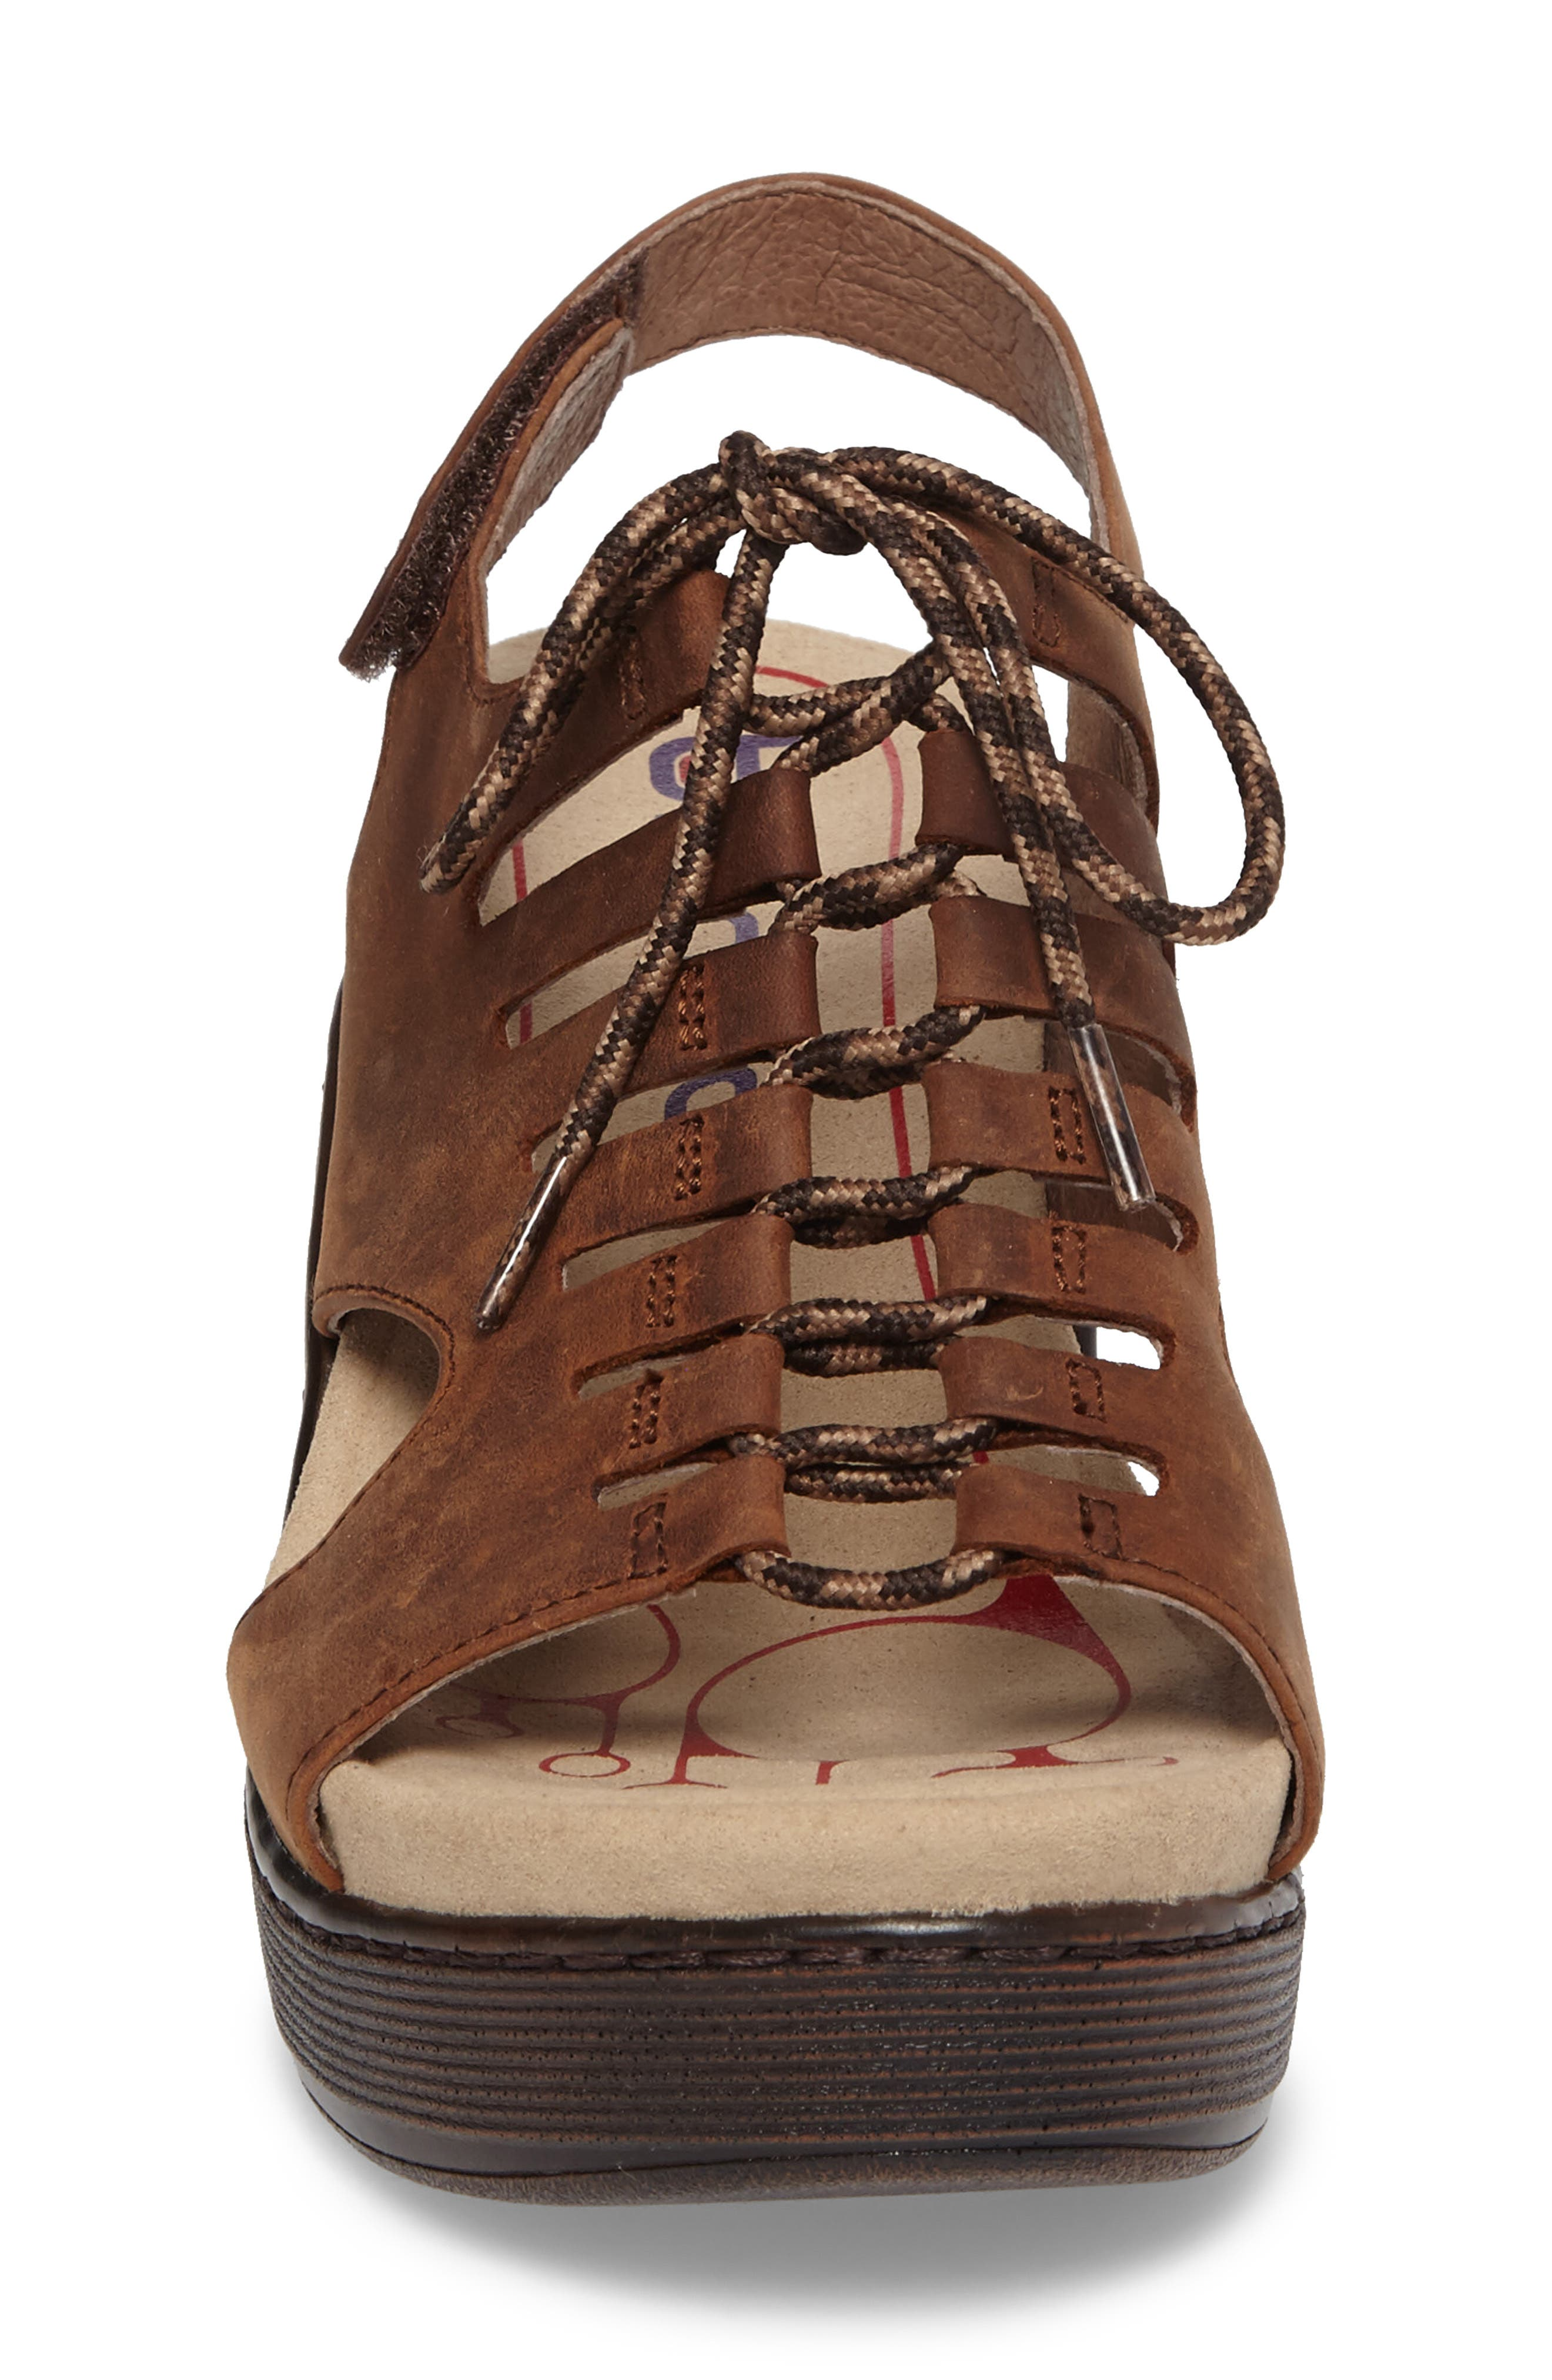 Sirus Wedge Sandal,                             Alternate thumbnail 4, color,                             Aztec Brown Leather